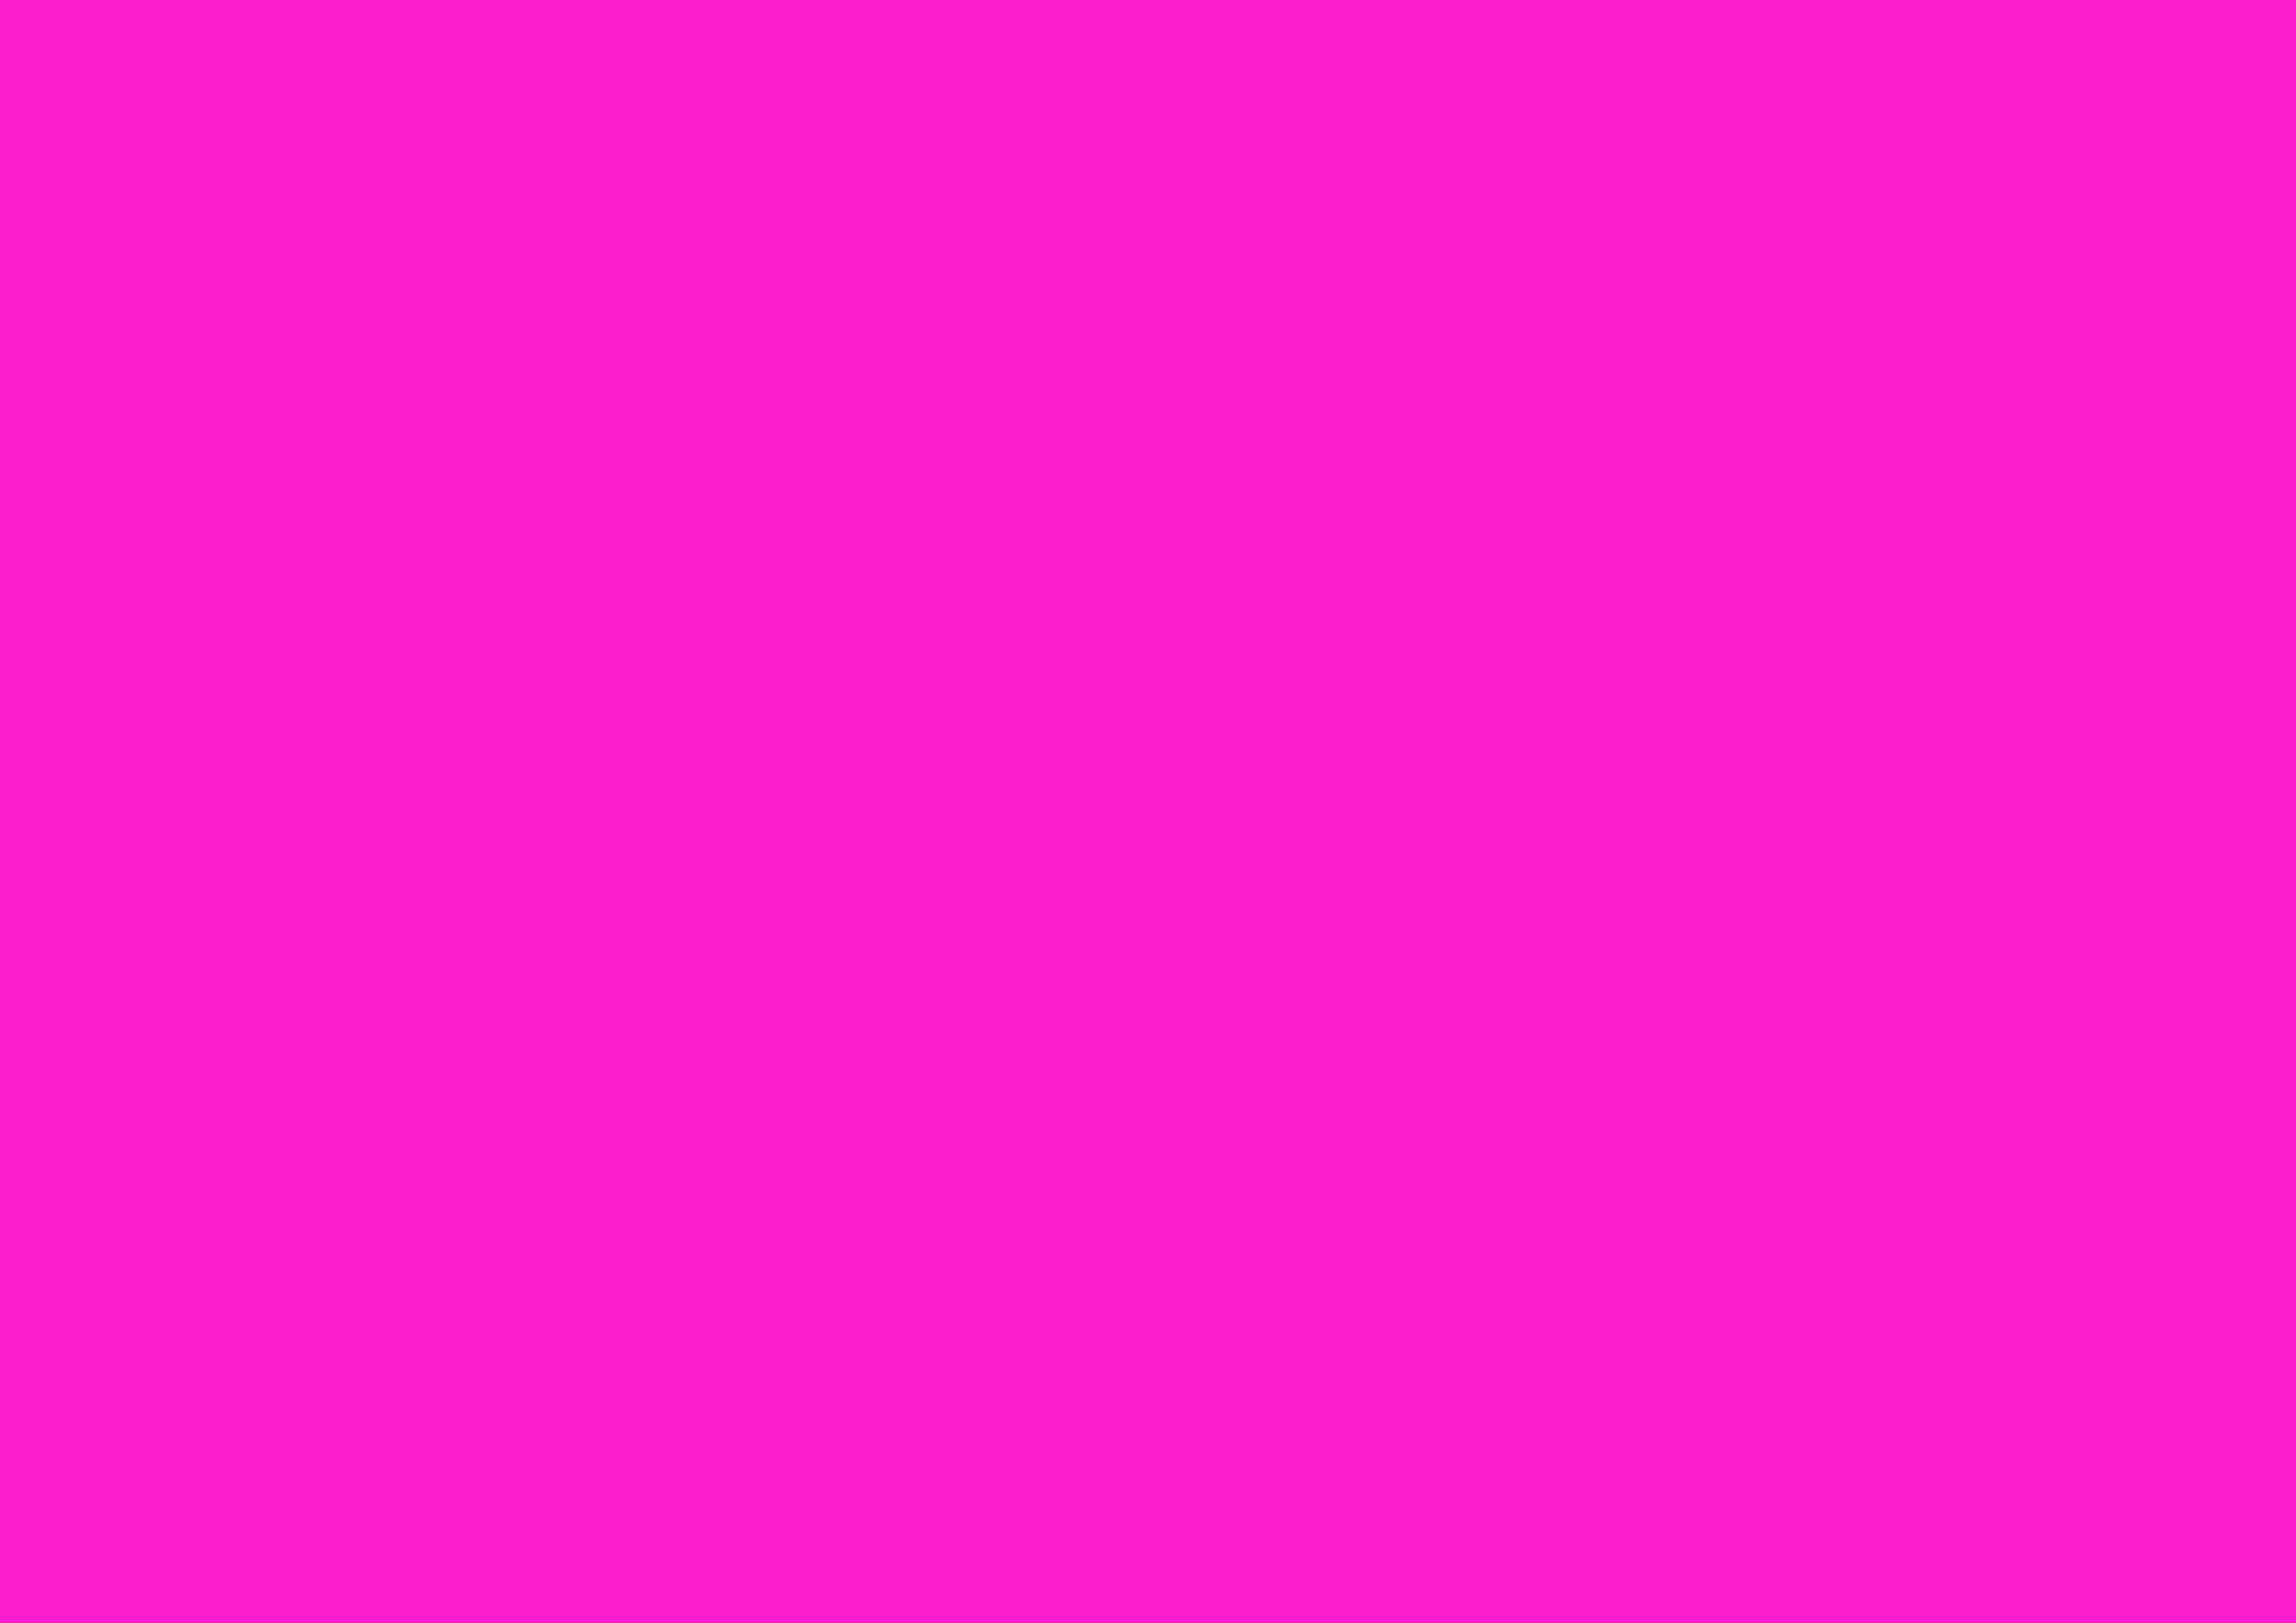 3508x2480 Hot Magenta Solid Color Background